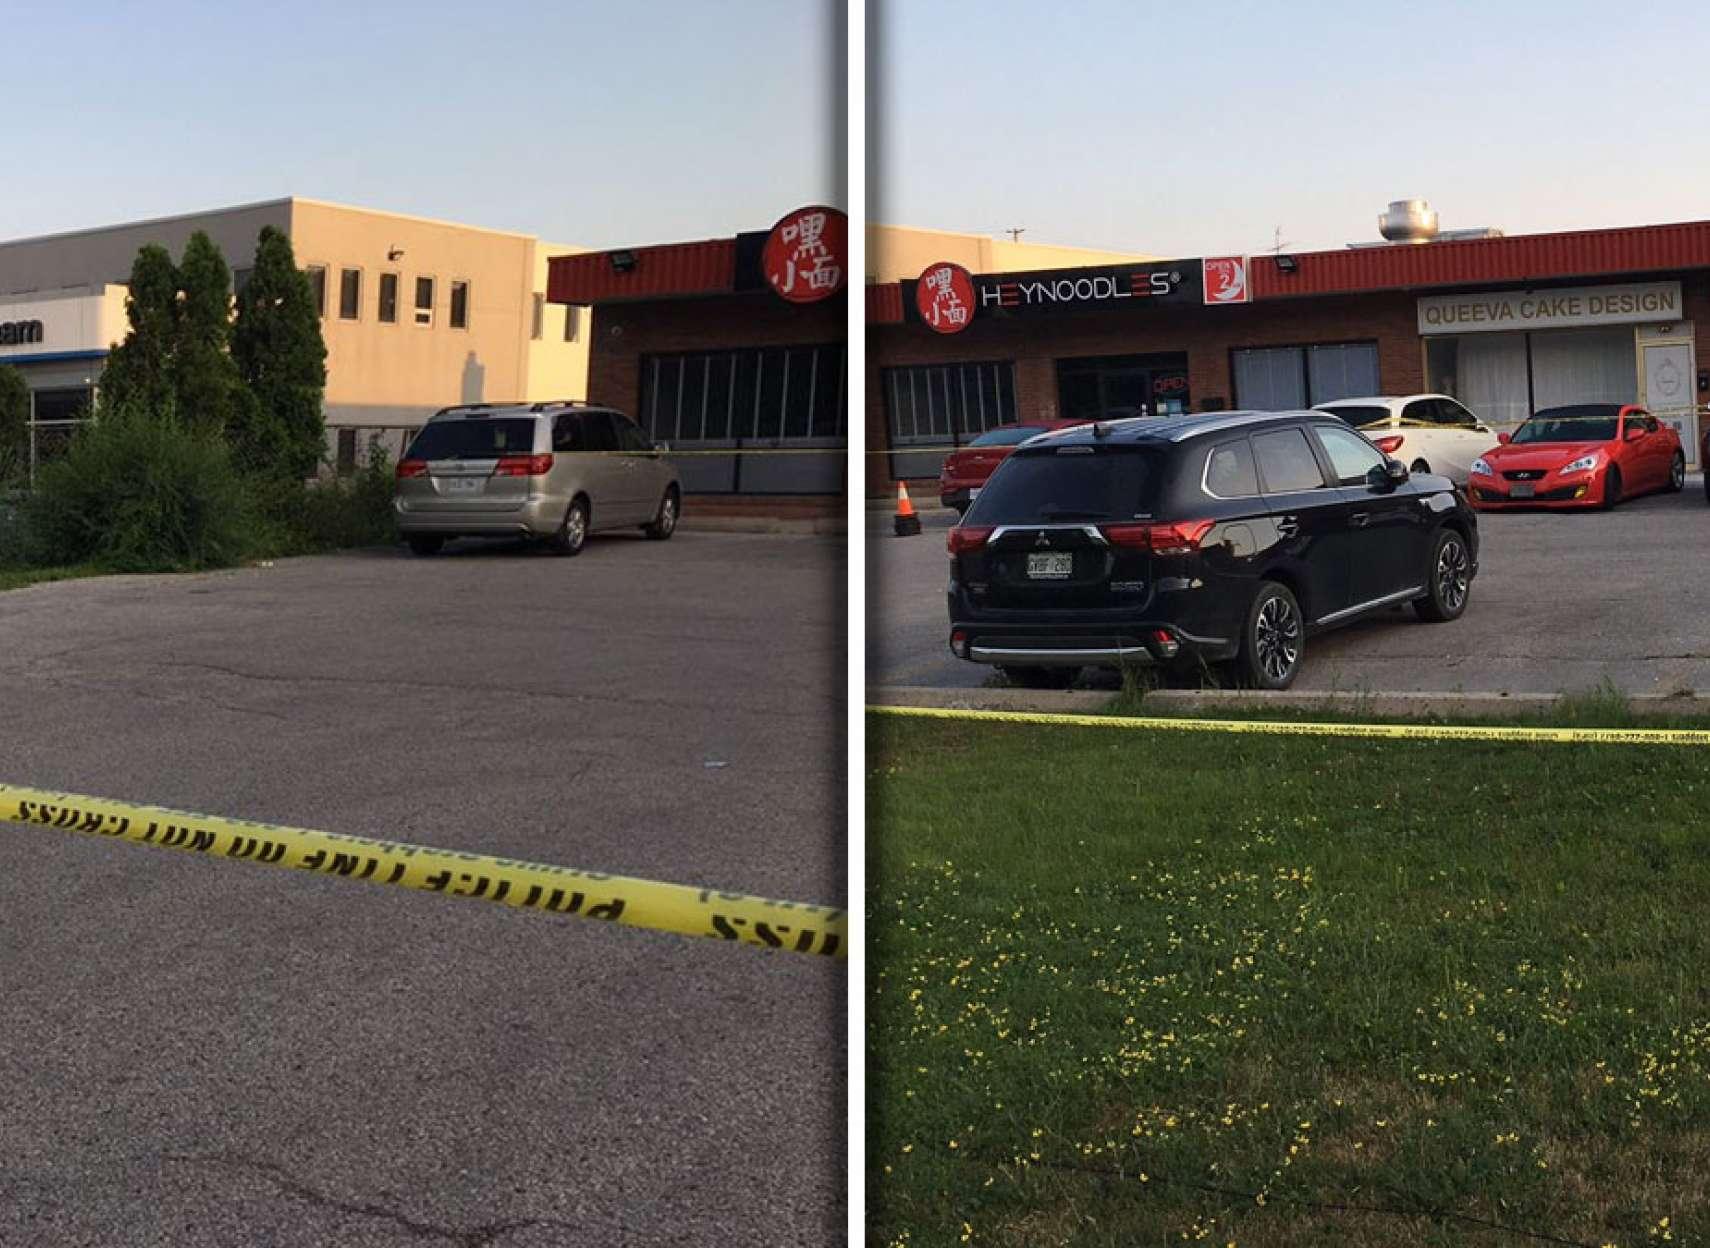 خبر-تورنتو-دستگیری-یک-ایرانی-تورنتویی-۳۳-ساله-سعید-ساوالان-پور-دو-سال-متهم-قتل